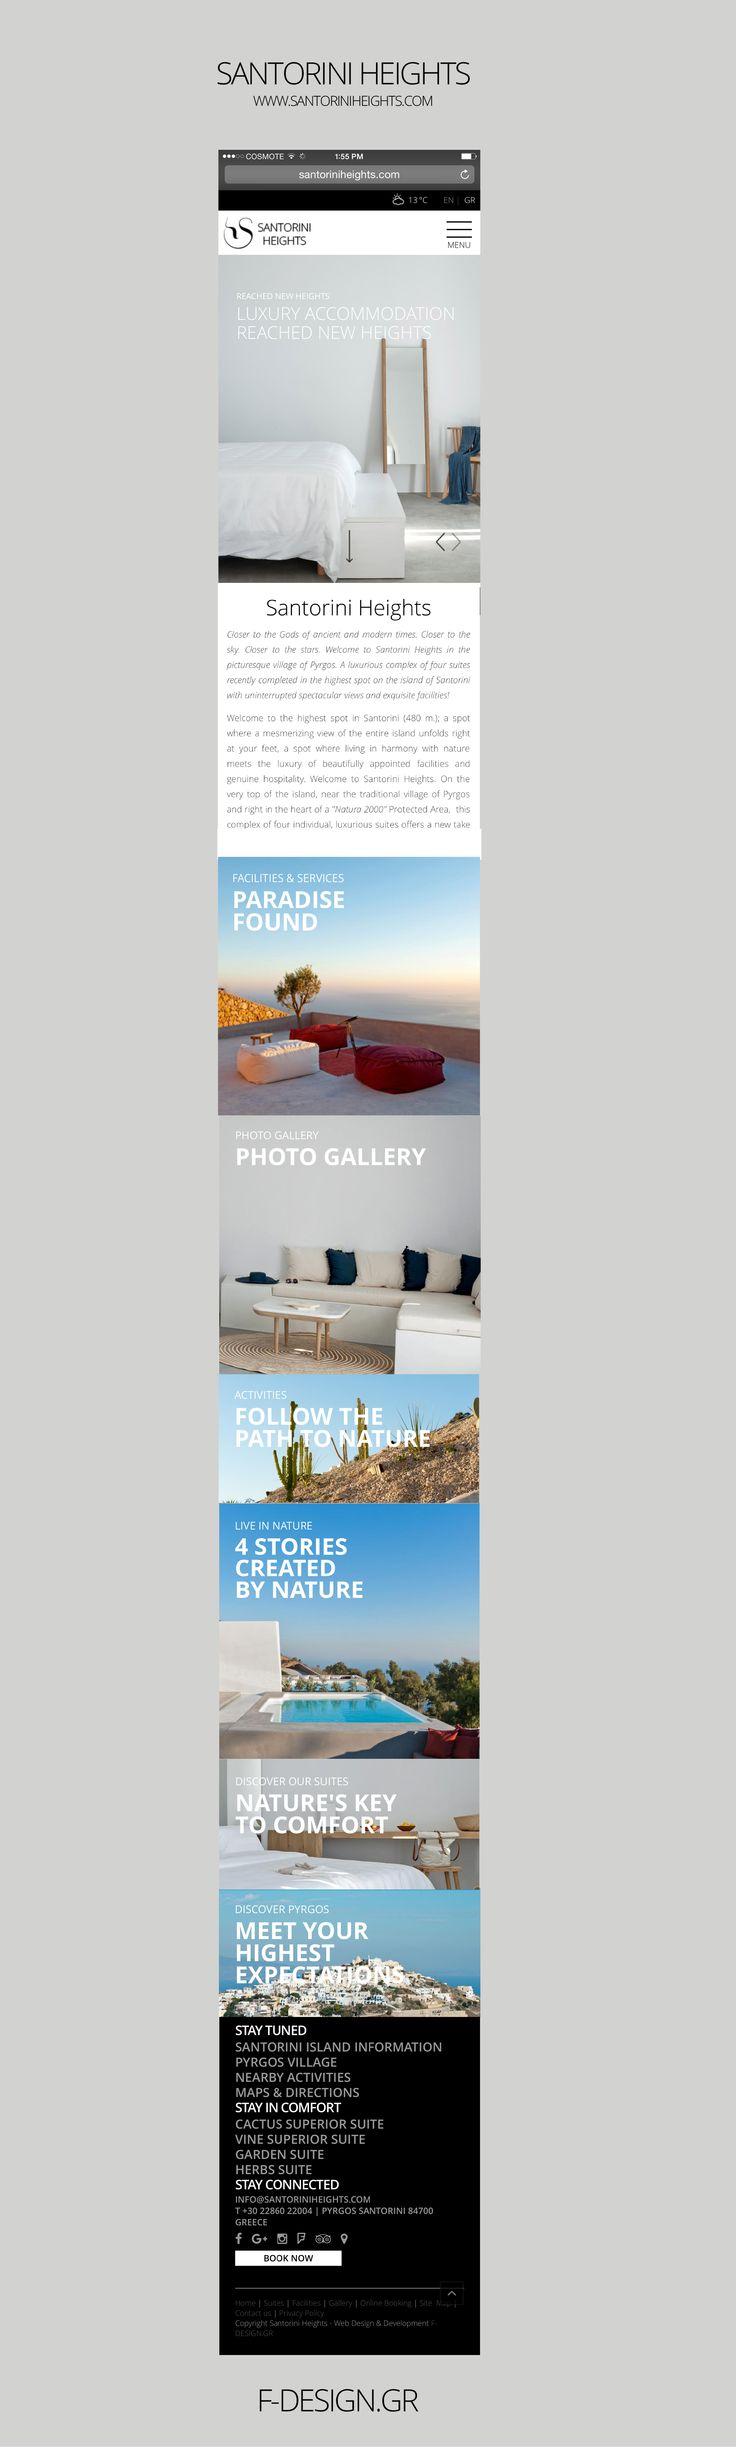 F- Design Website for Santorini Heights at www.santoriniheights.com. #web #website #santorini